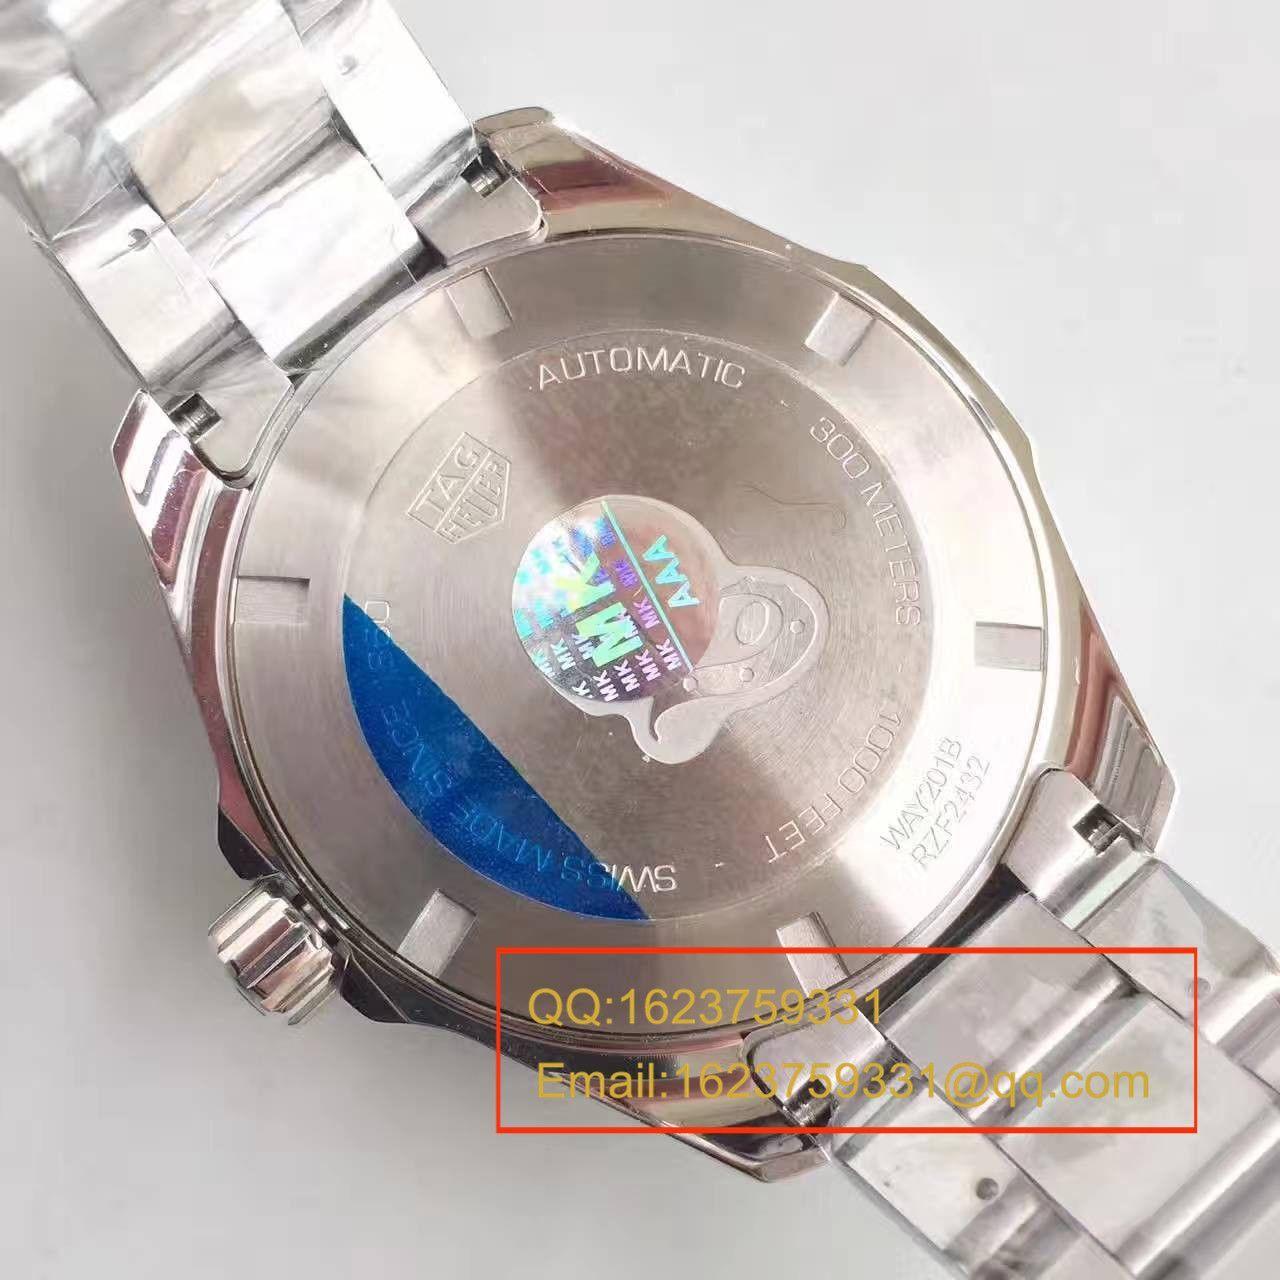 【MK厂1:1高仿复刻手表】泰格豪雅竞潜系列WAY201A.BA0927腕表